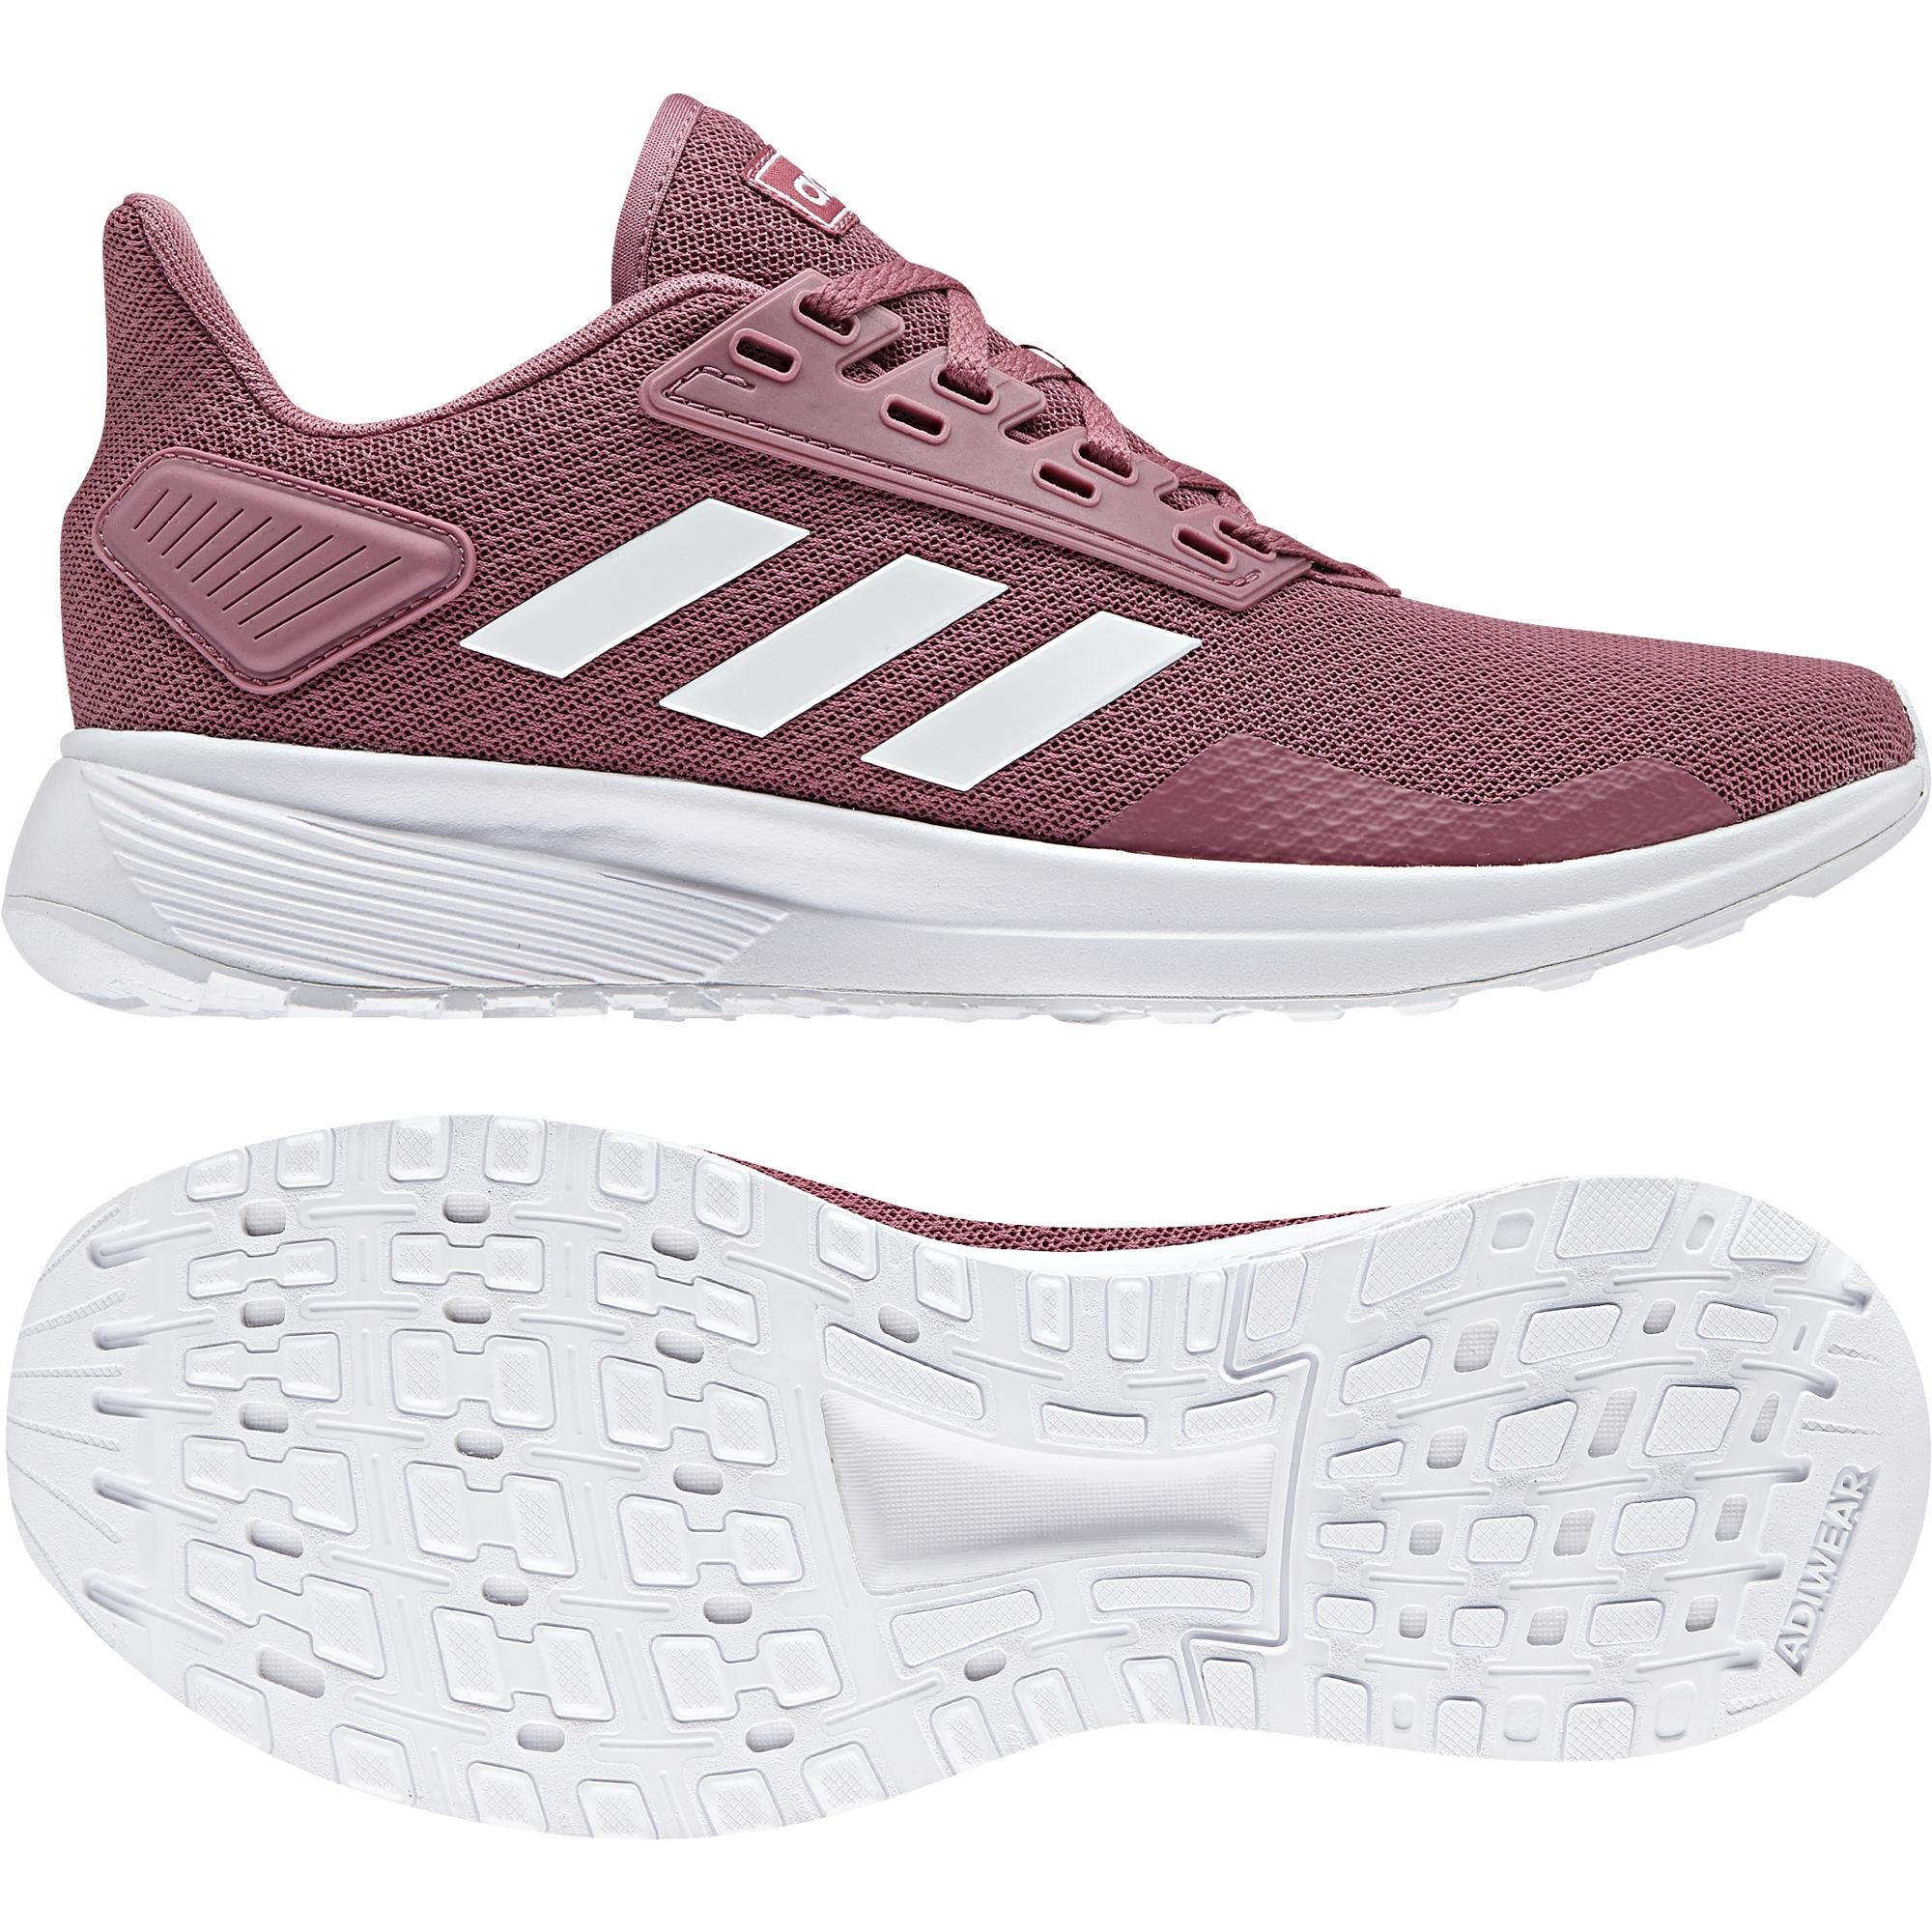 newest 21a7f 2128e Chaussures femme adidas Duramo 9